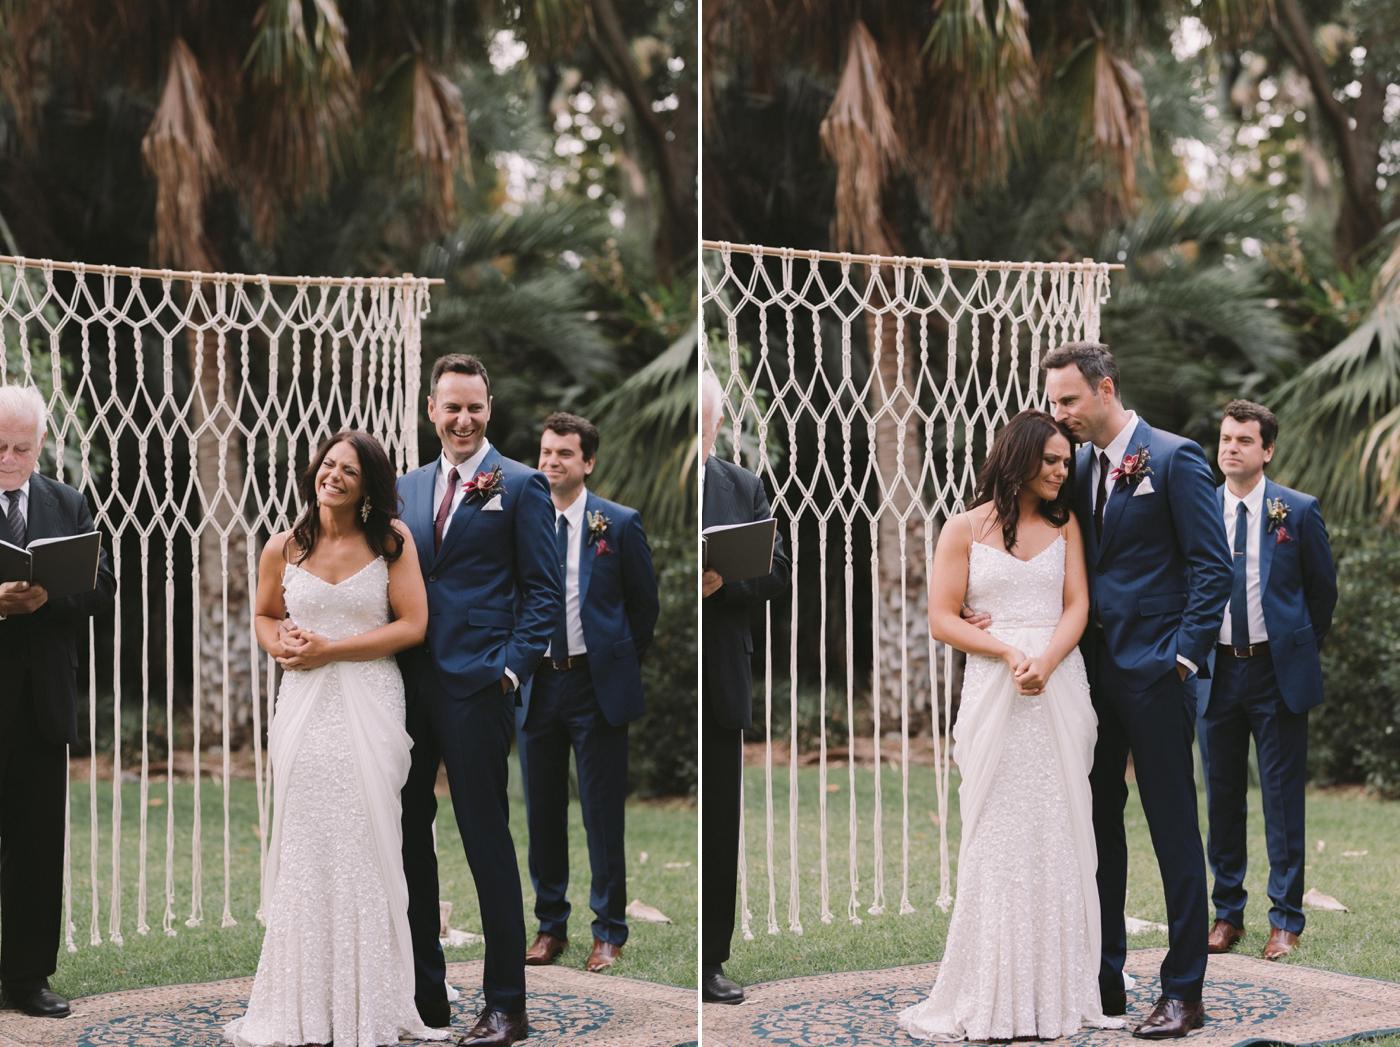 Kellie & Brent - Adelaide City Wedding - Natural wedding photography in Adelaide - Katherine Schultz - www.katherineschultzphotography.com 42